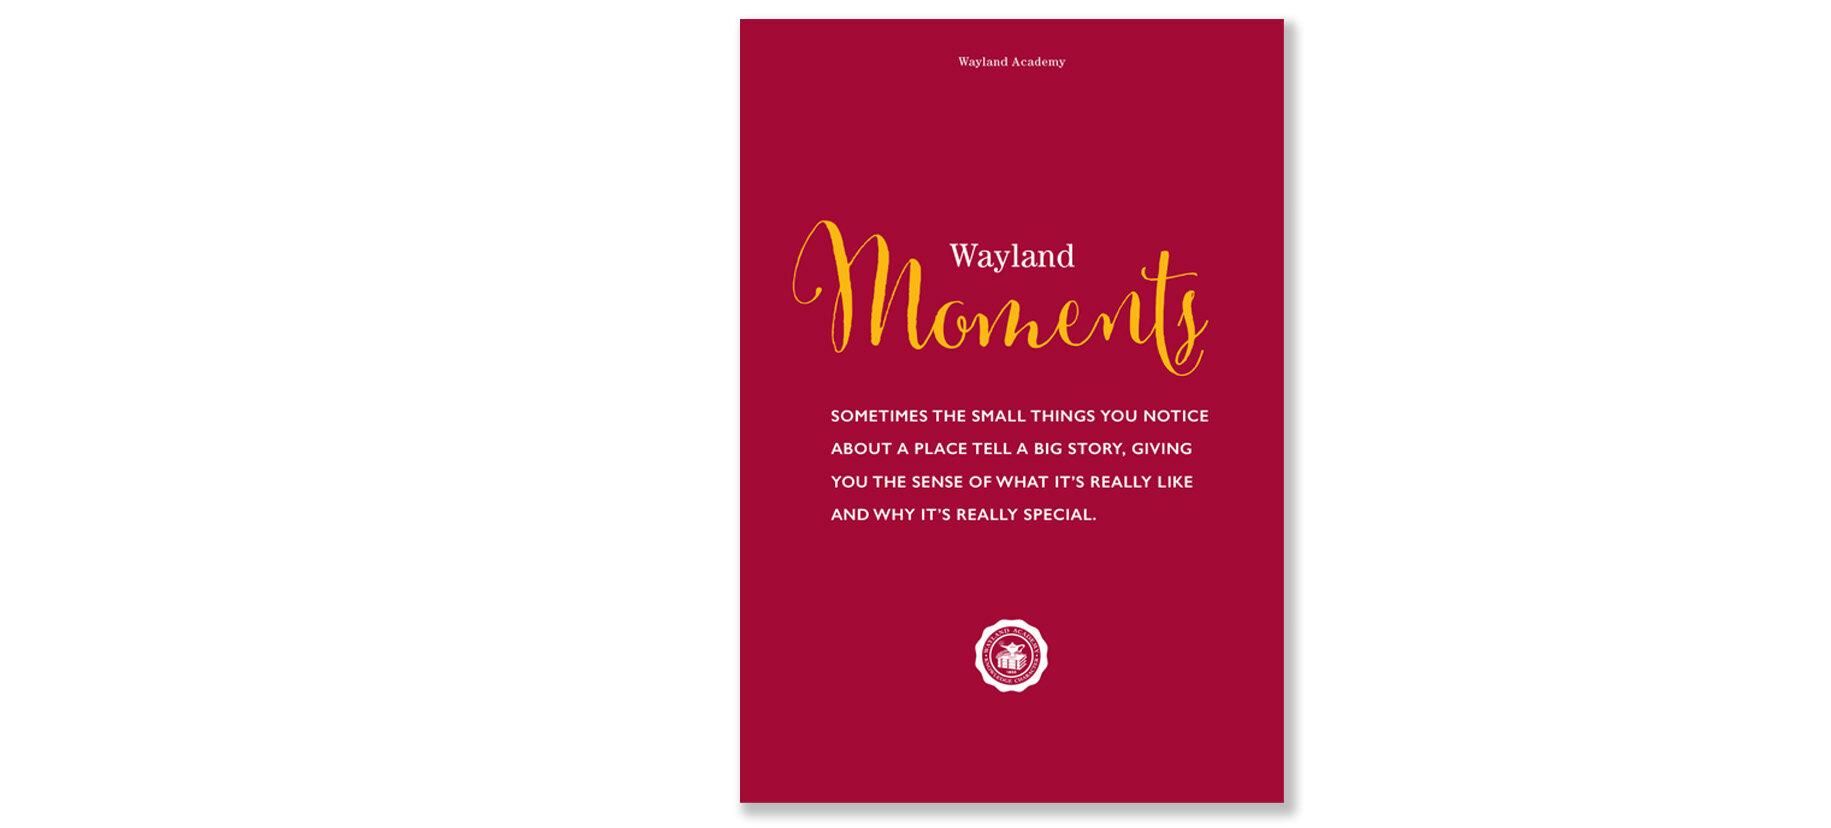 wayland-academy-moments-brochure-kelsh-wilson-front-cover.jpg